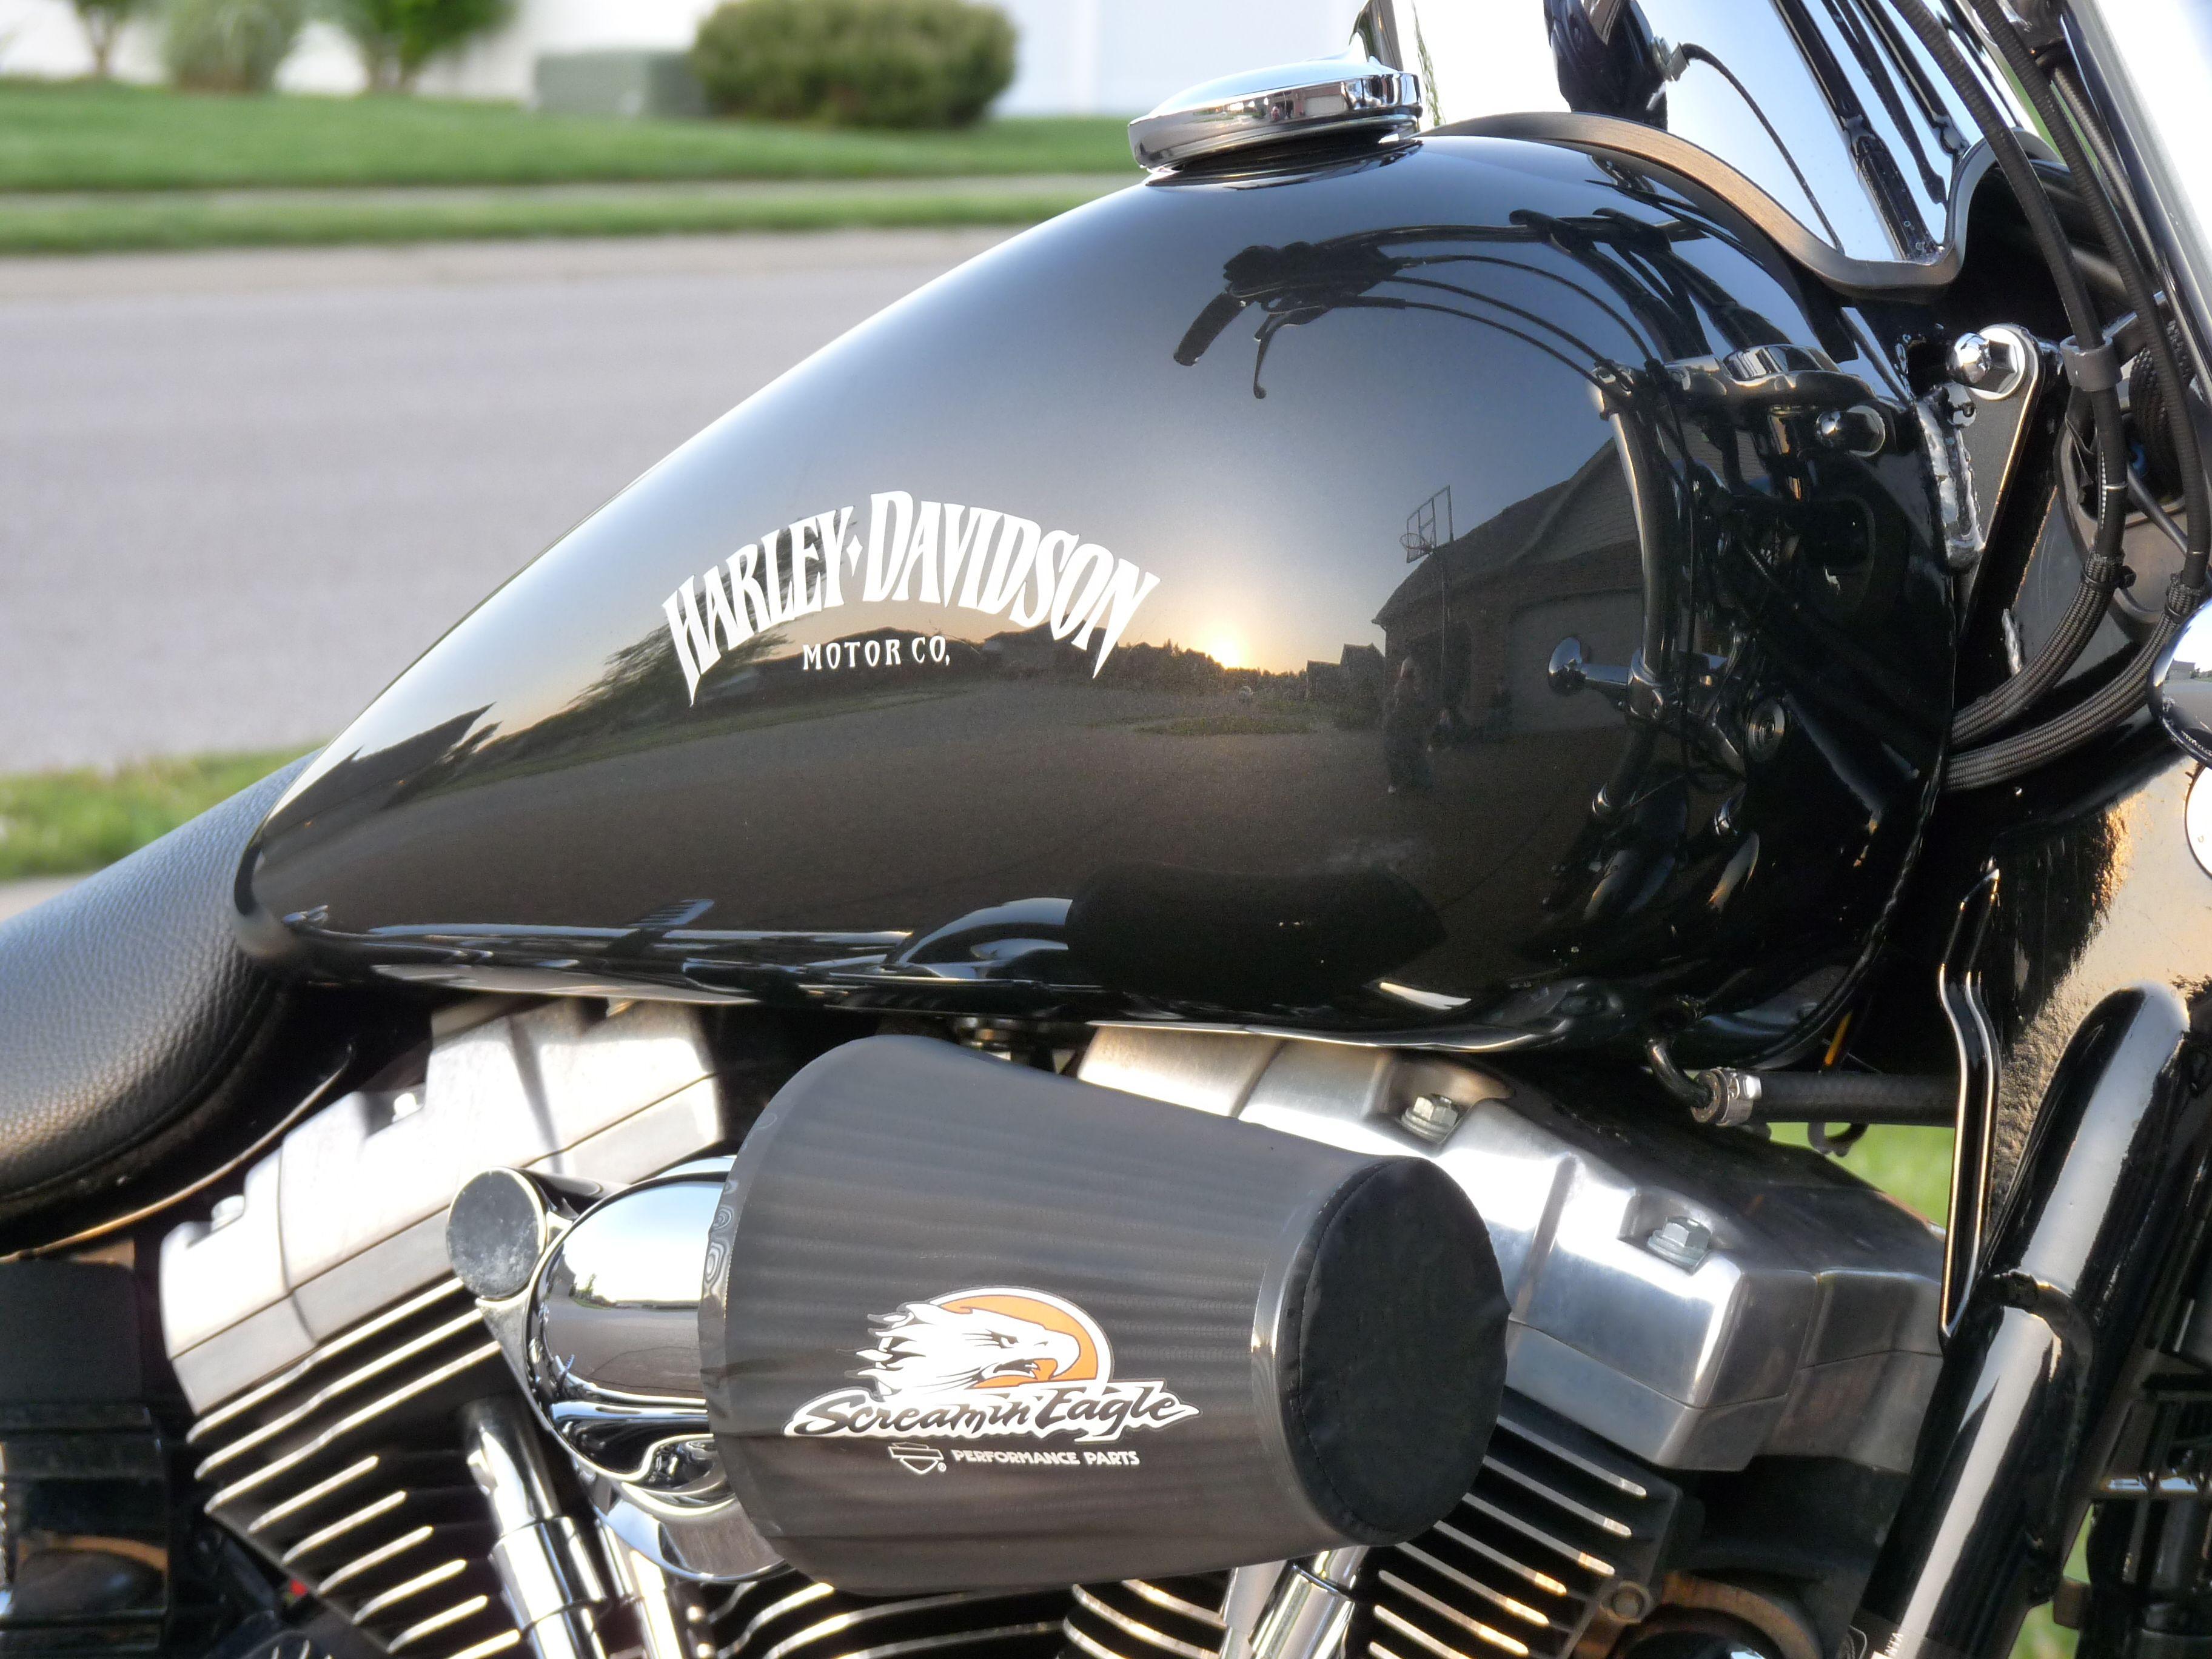 Harleydavidsonemblemsanddecals Tank Emblem To Decalsticker - Stickers for motorcycles harley davidsonsmotorcycle decals and stickers